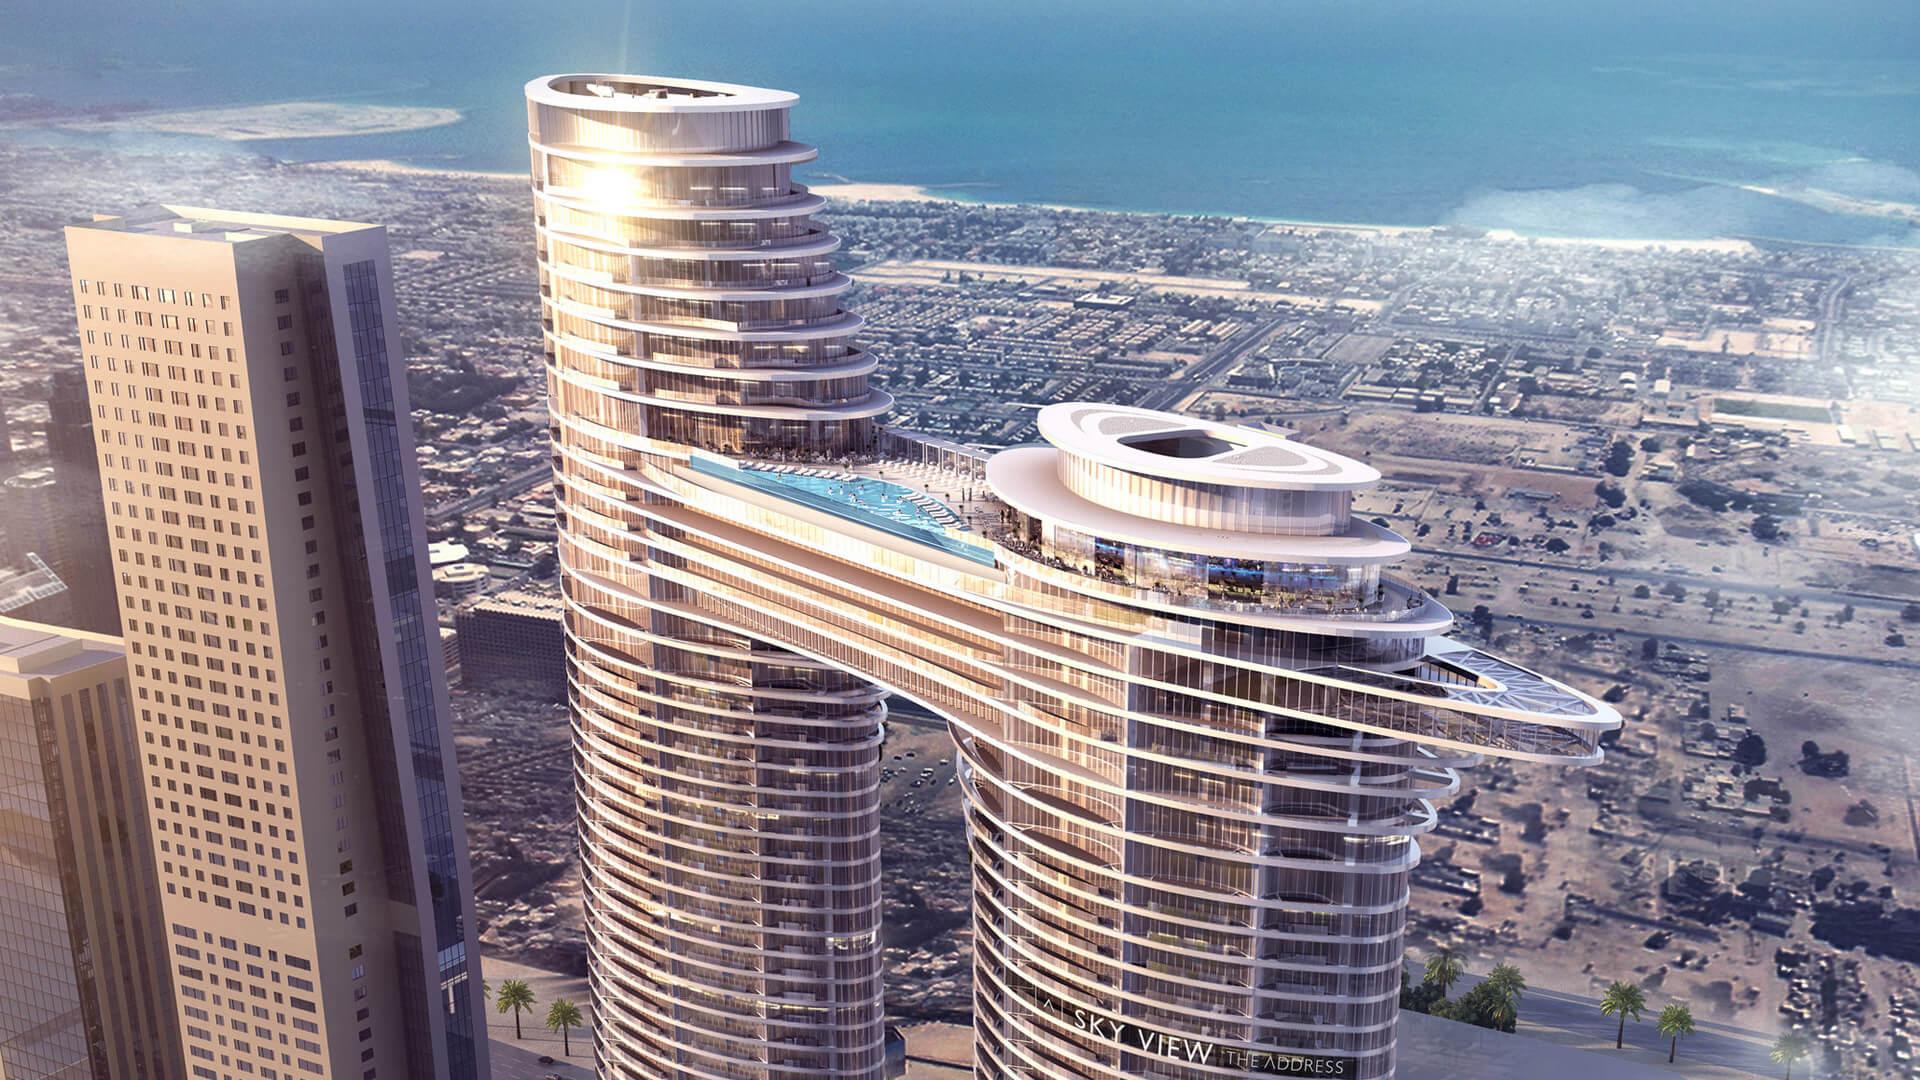 THE ADDRESS SKY VIEW TOWERS HOTEL APARTMENTS, Downtown Dubai, EAU – foto 1